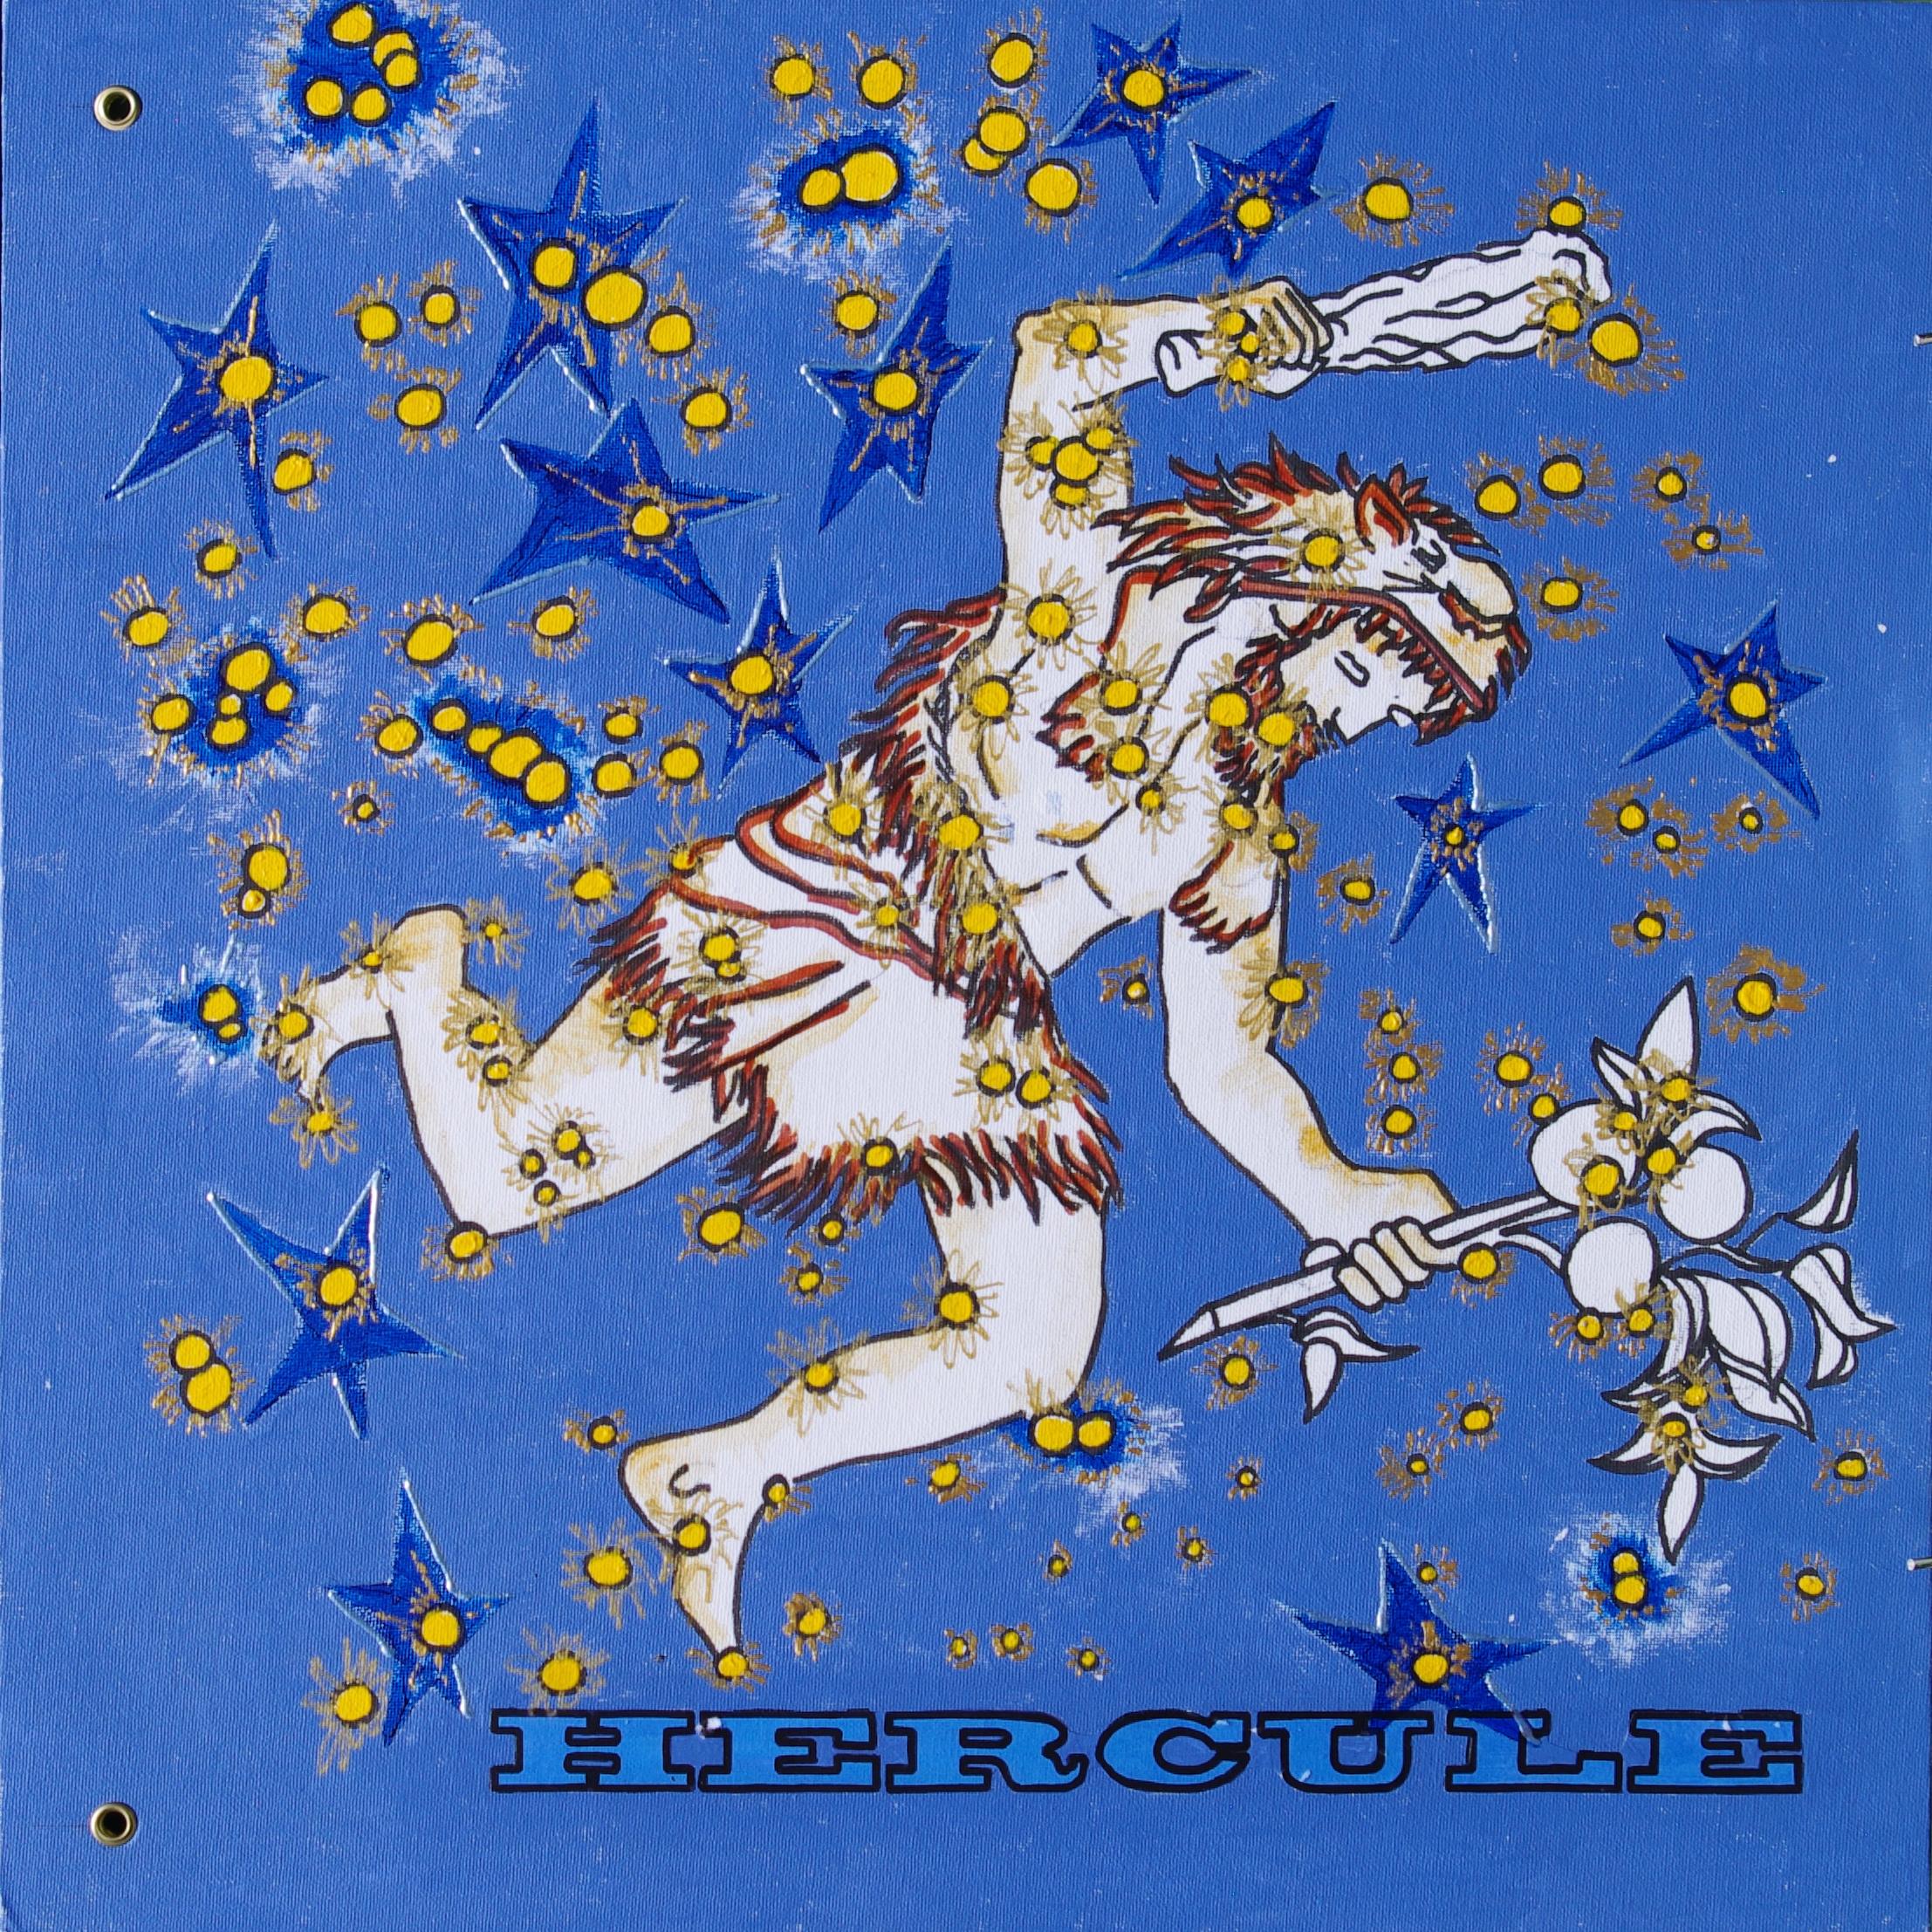 Constellation d'Hercule